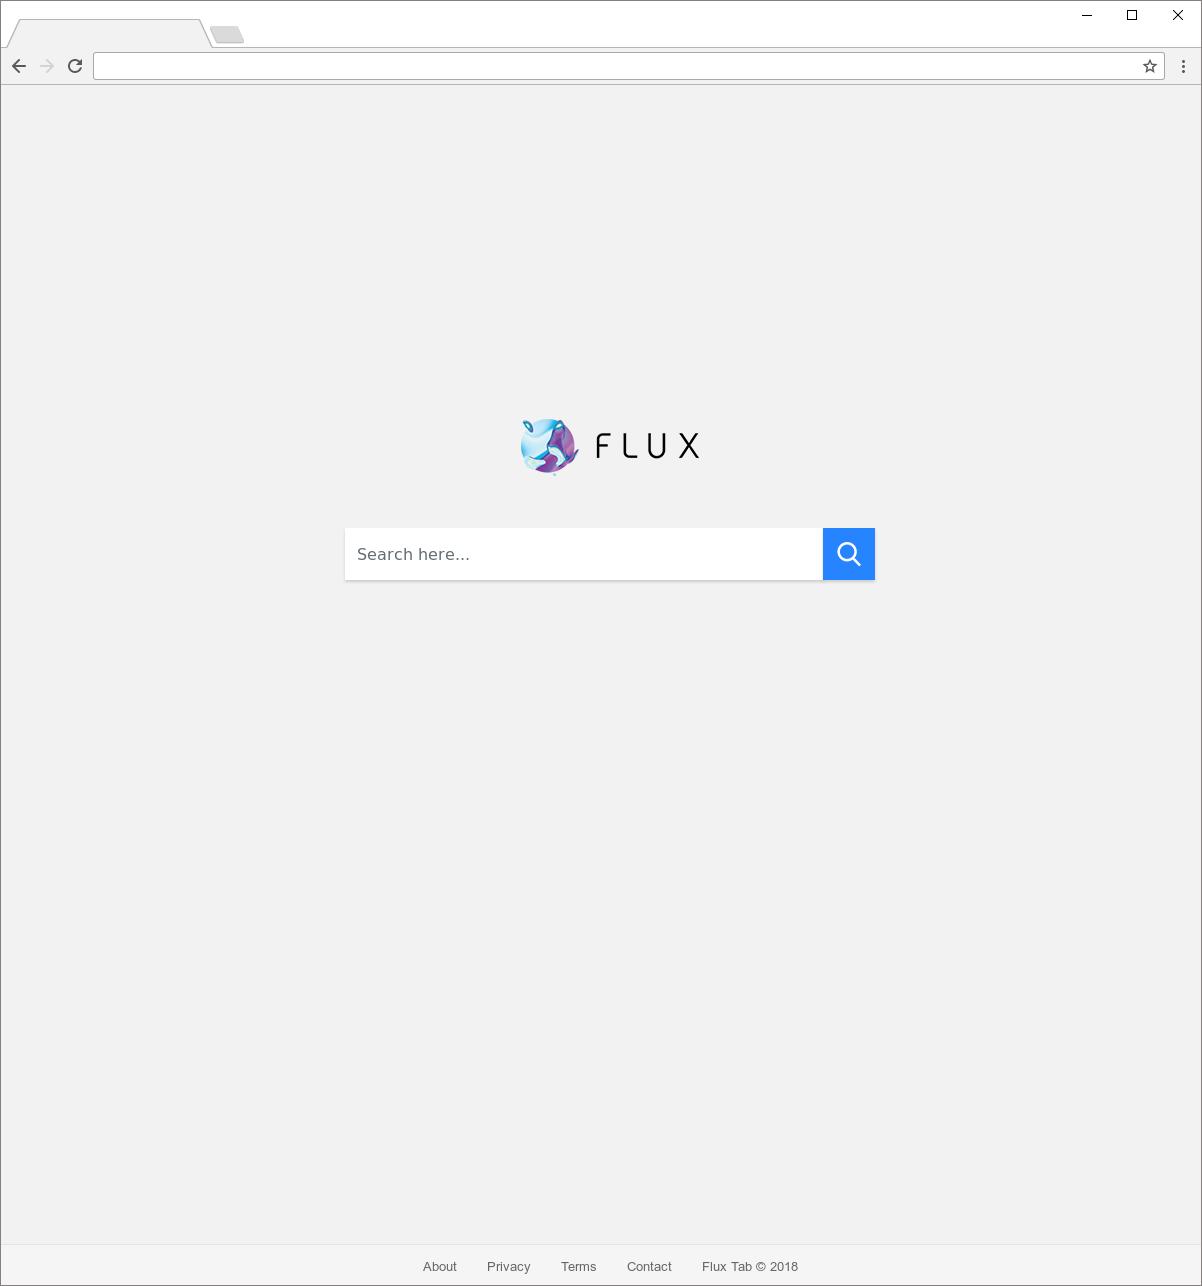 Fluxsearch.com Hijacker